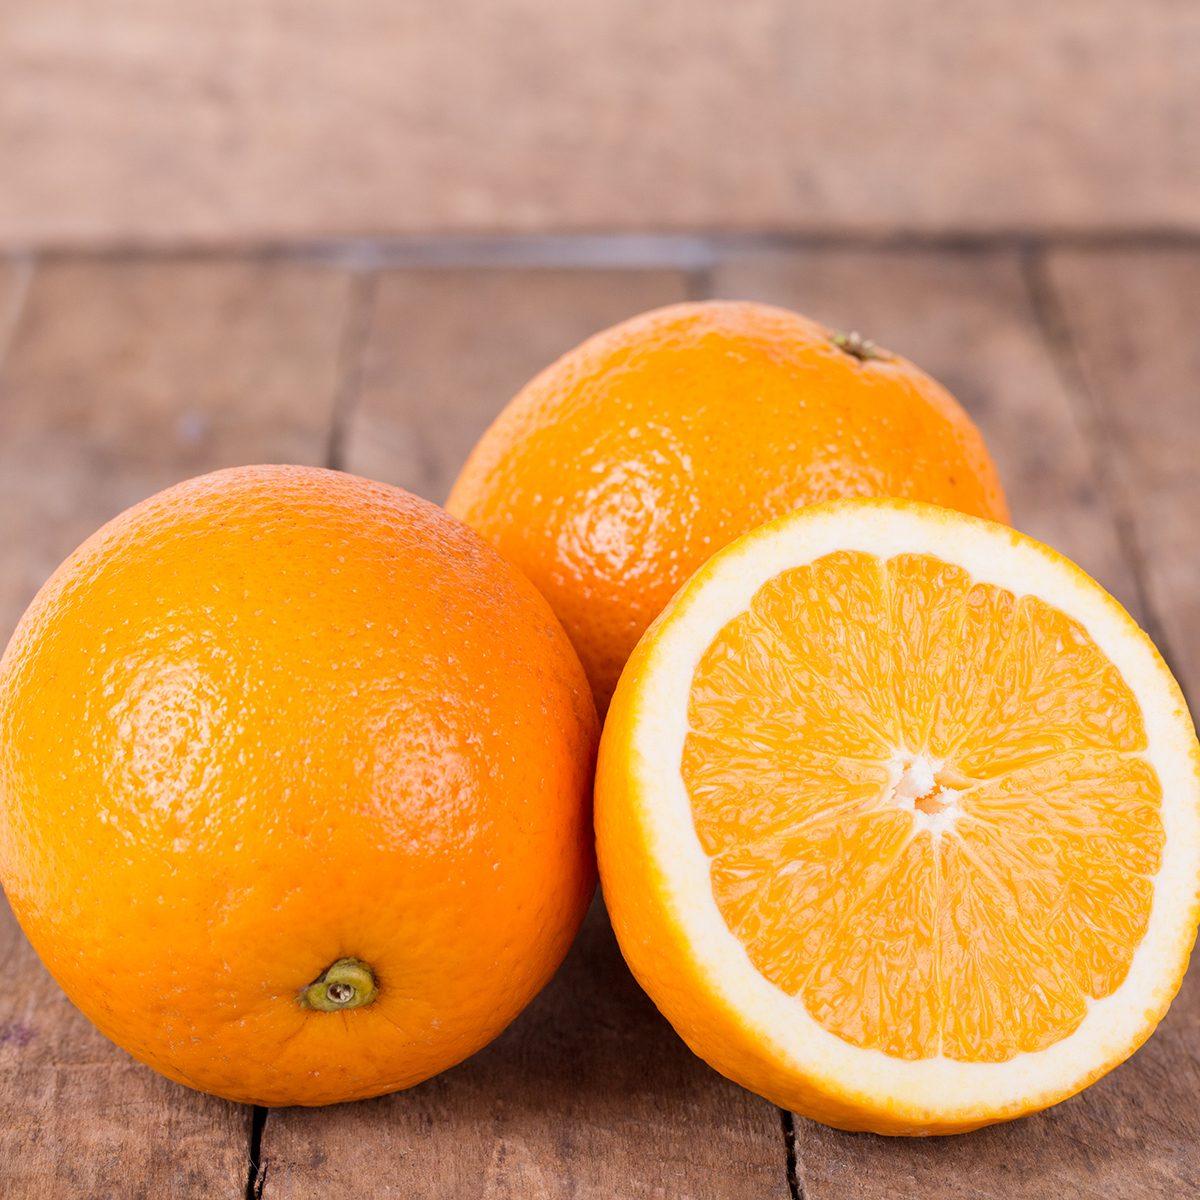 fruits for diabetics fresh, juicy, orange on a wooden background